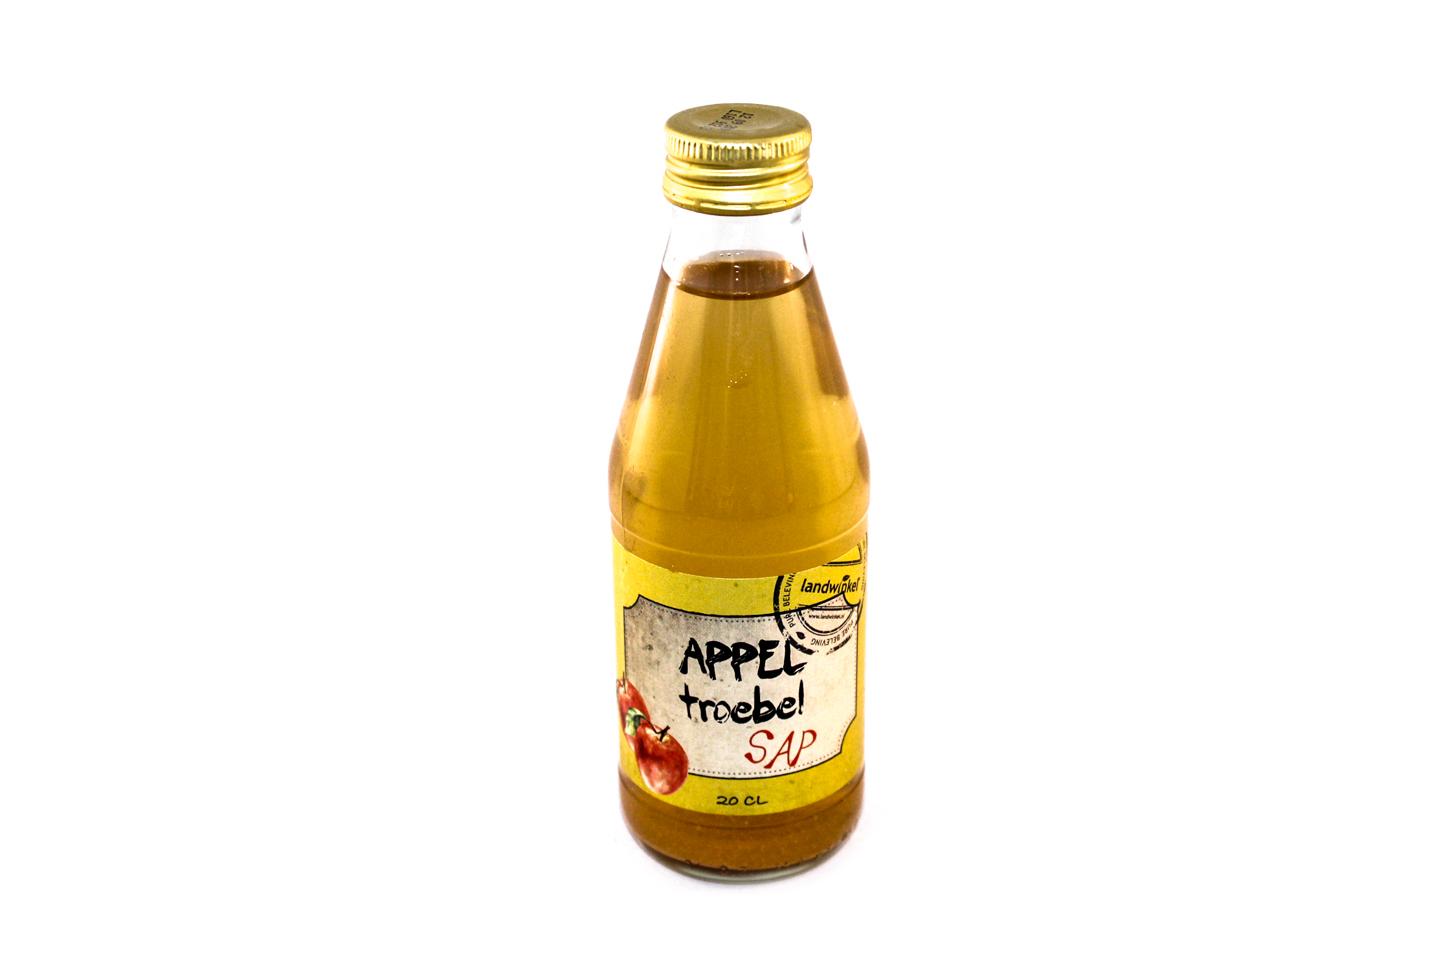 Appel Troebel sap